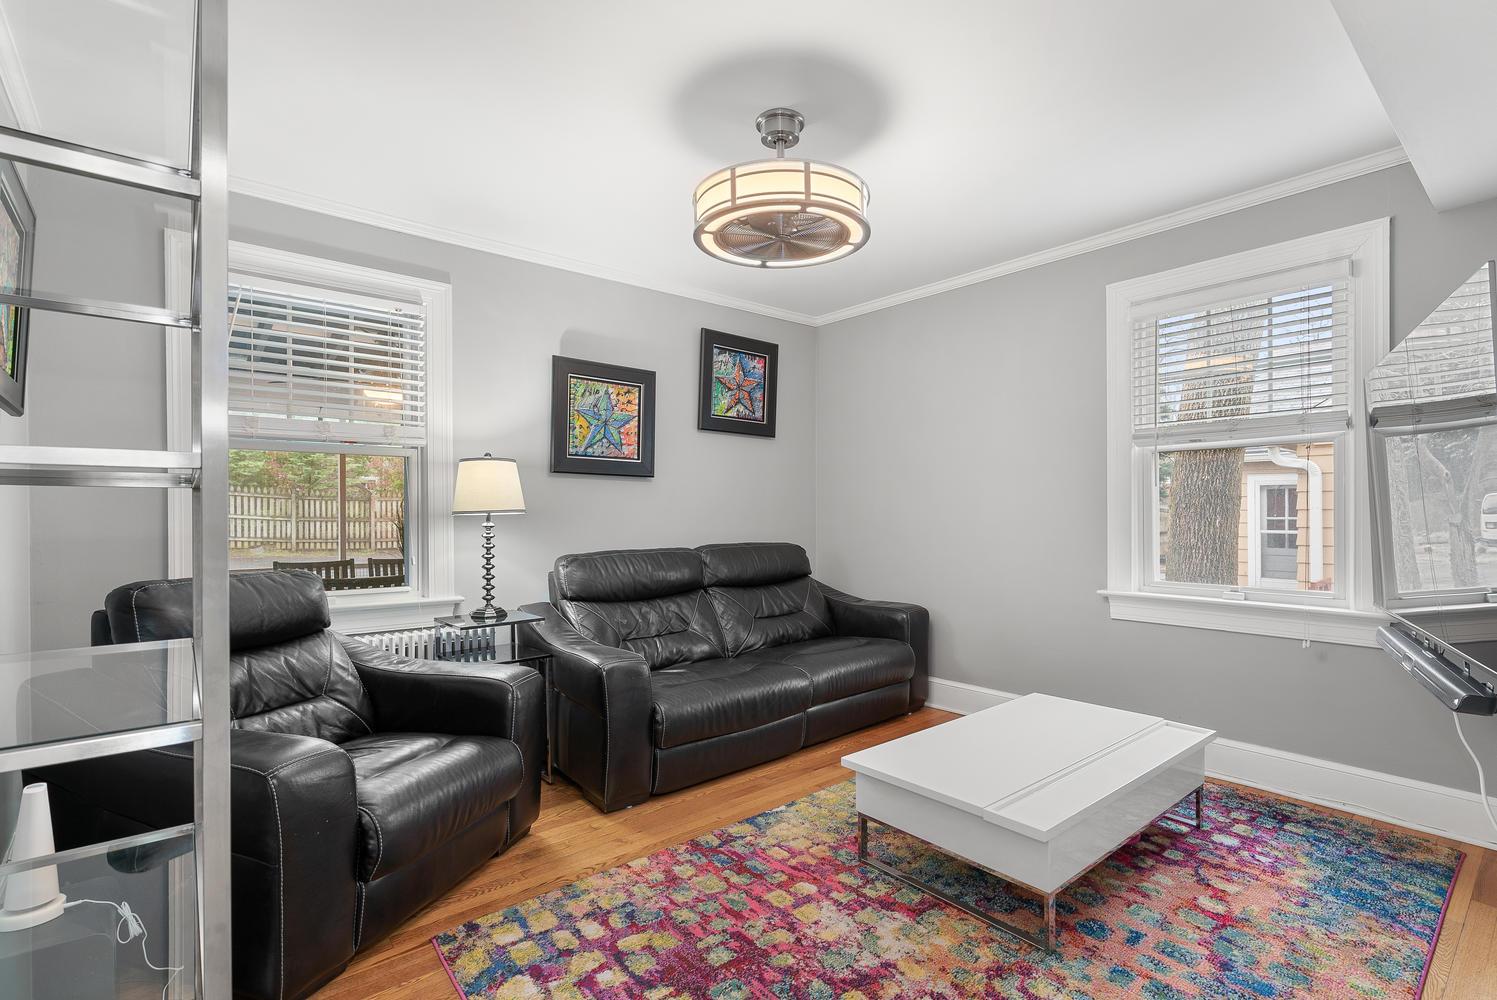 9111 Louis Ave-large-023-014-Interior-1498×1000-72dpi